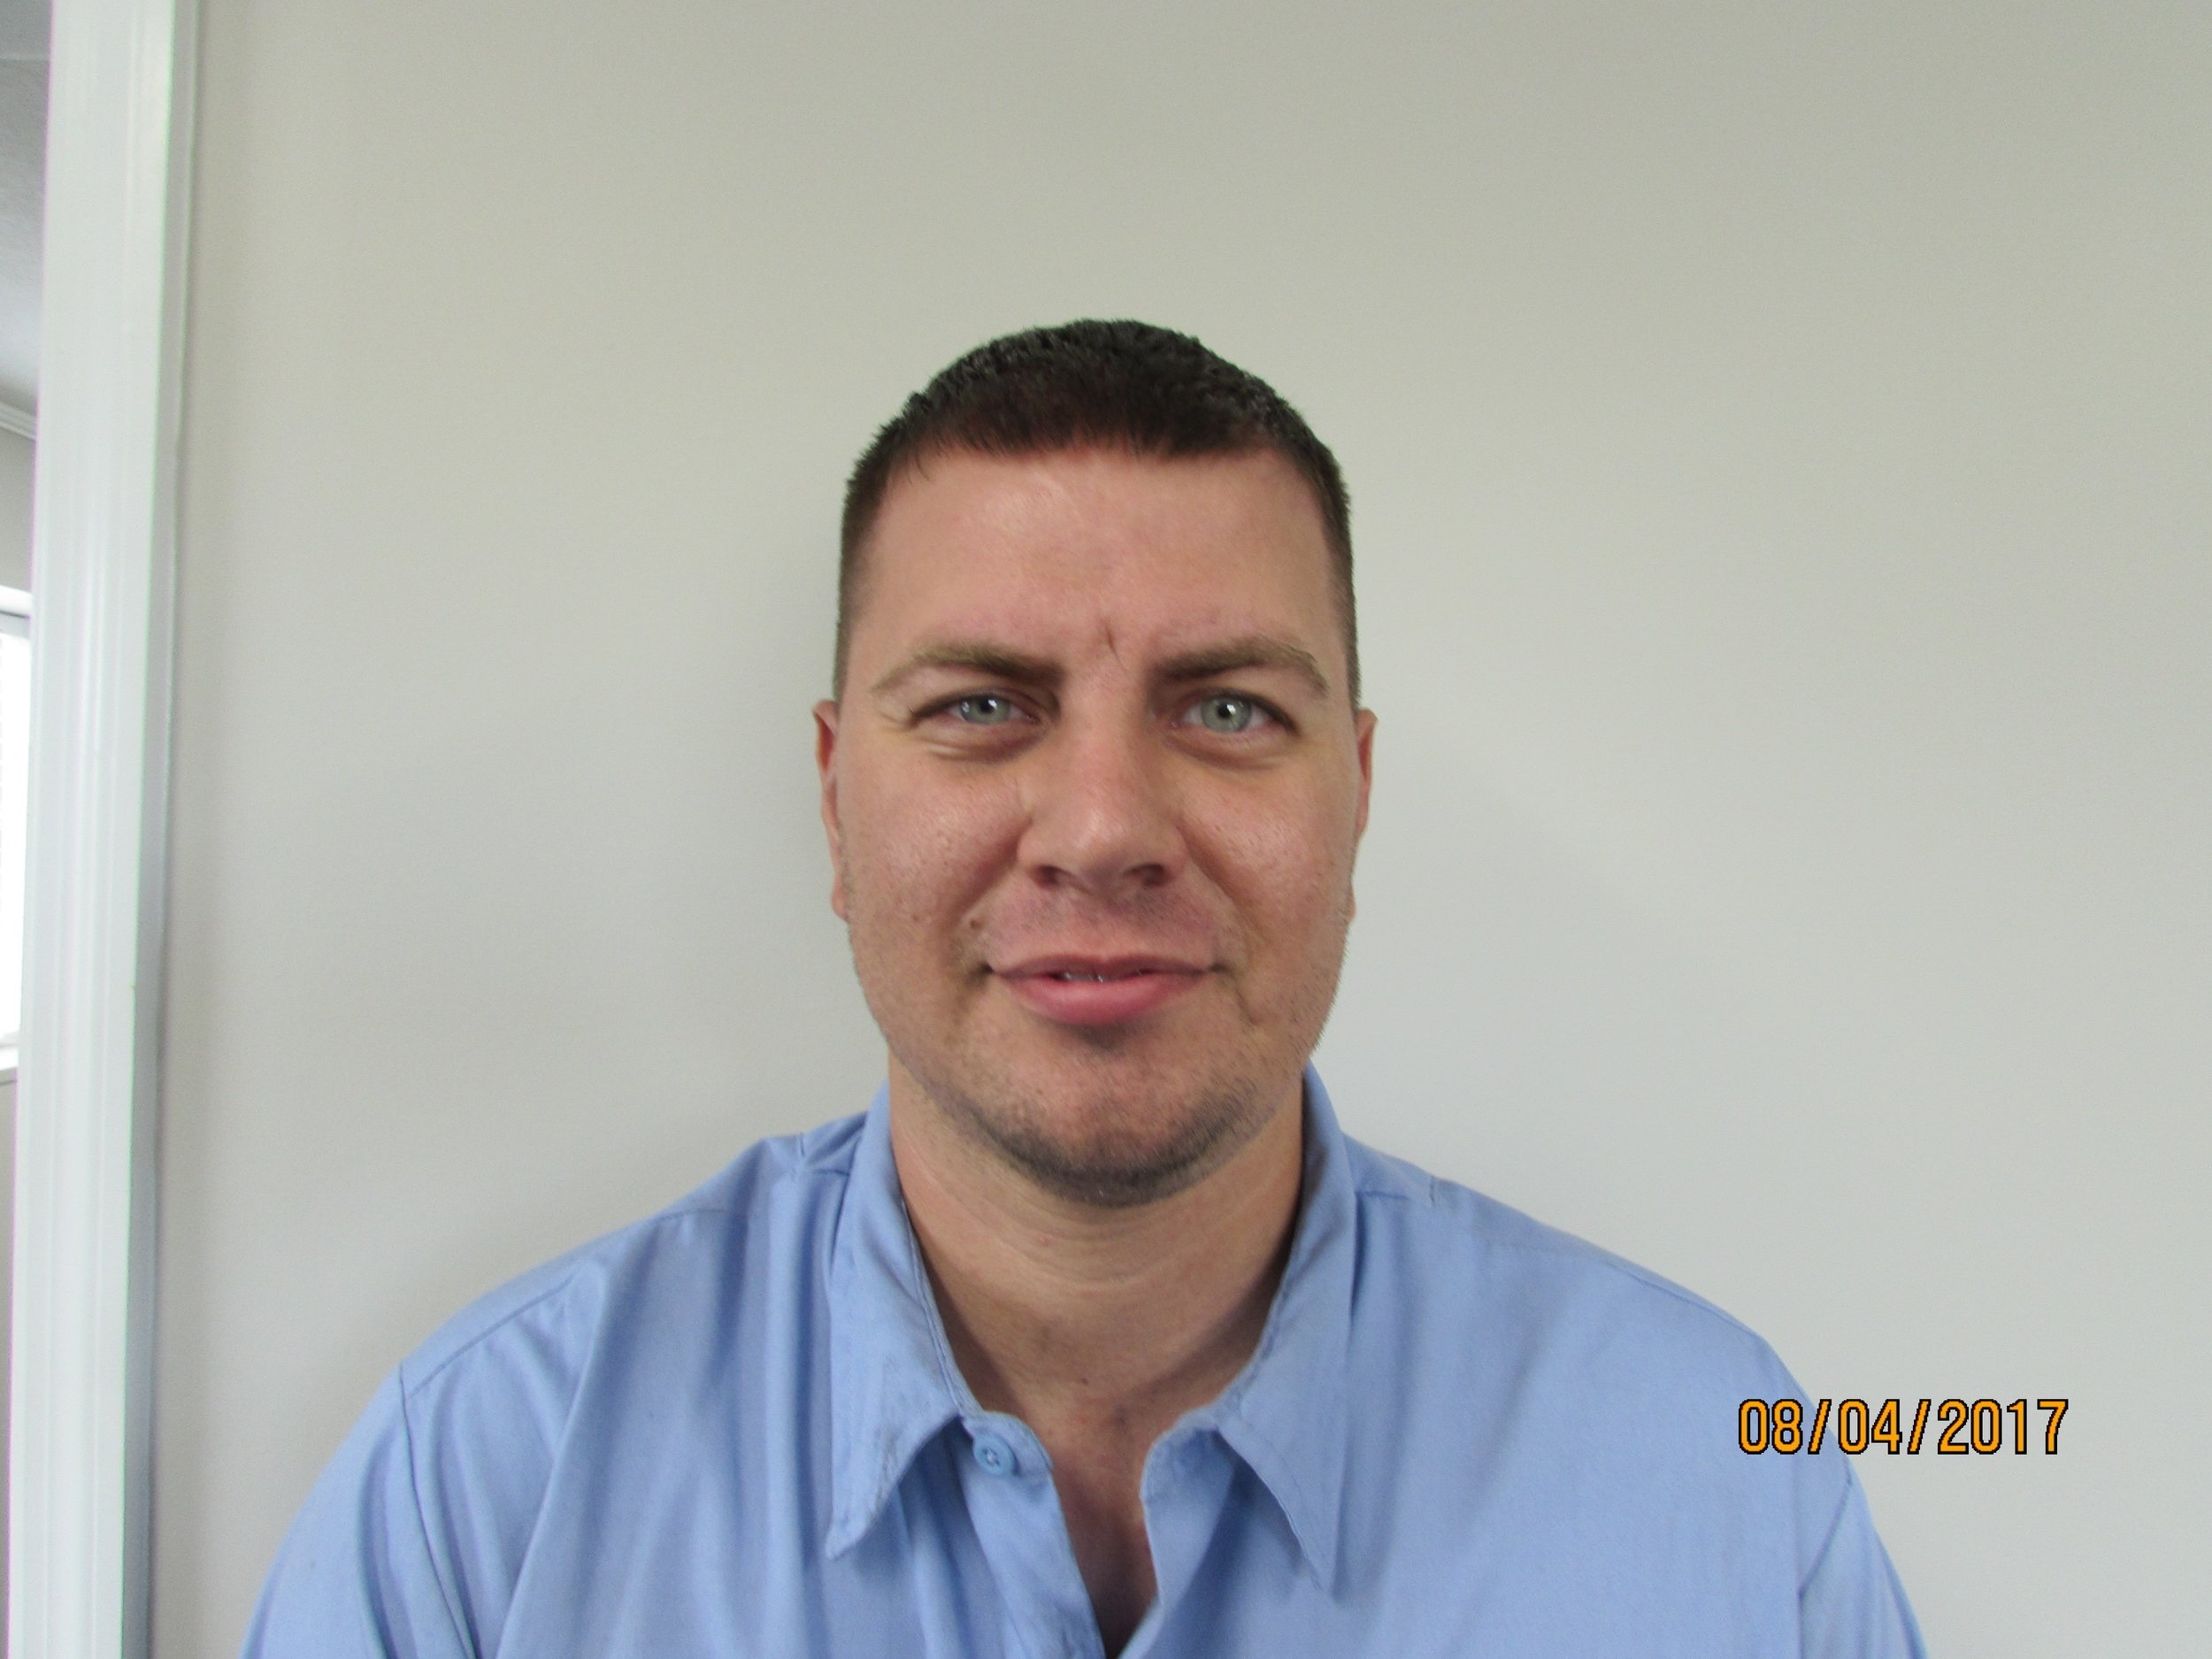 Jeremy Miles - Warehouse / Customer Service / Delivery